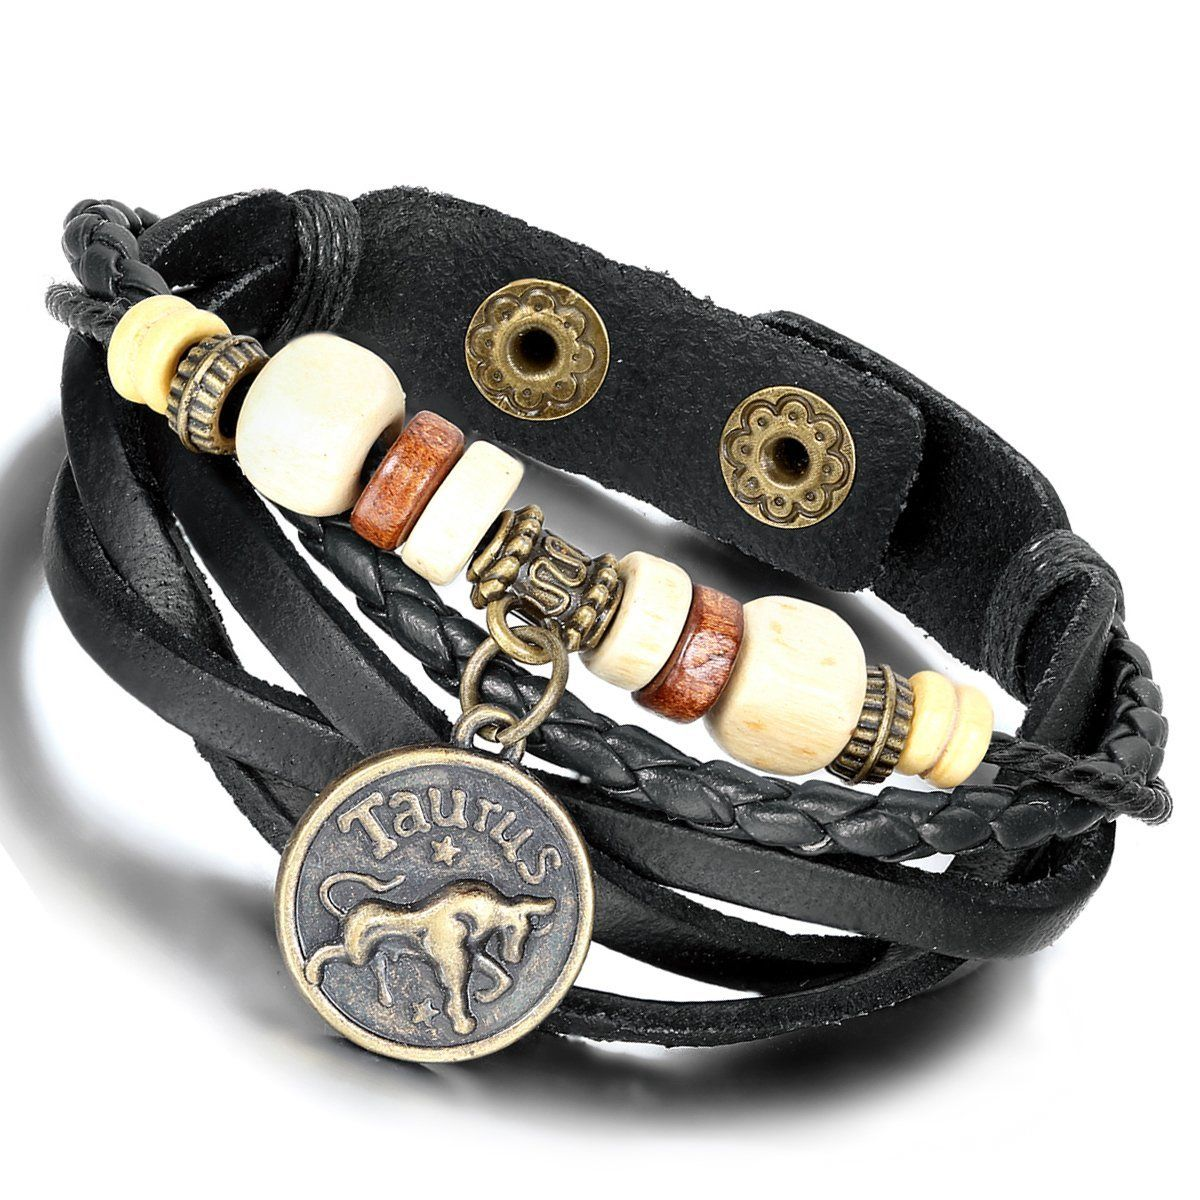 Amazon arocent handmade leather bracelet with constellation